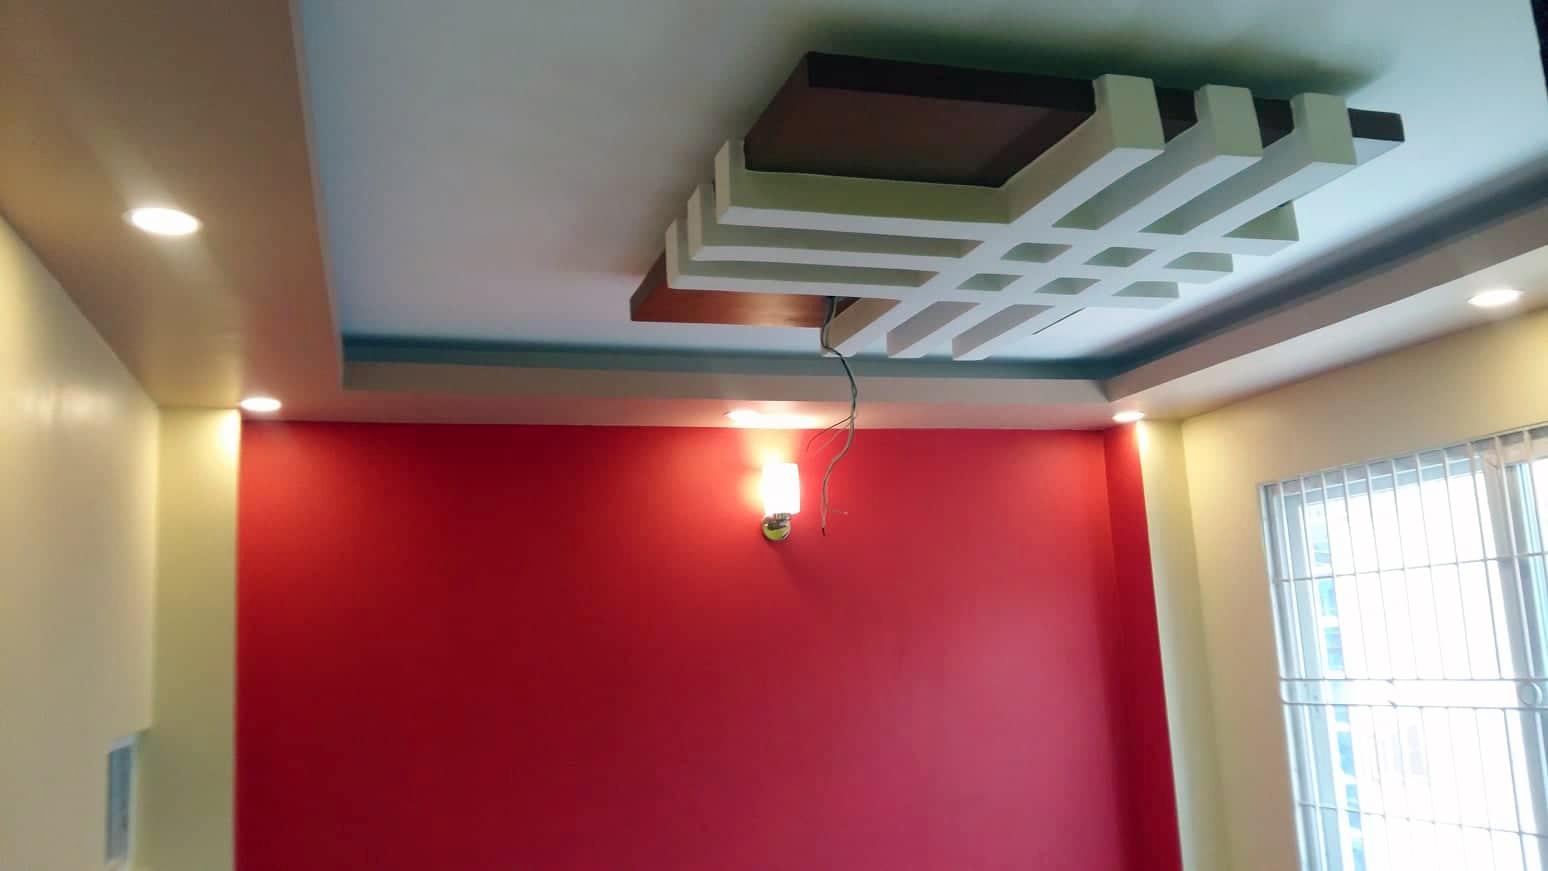 Eproperty Nepal | 2 5 Storey House for Sale near Pepsicola